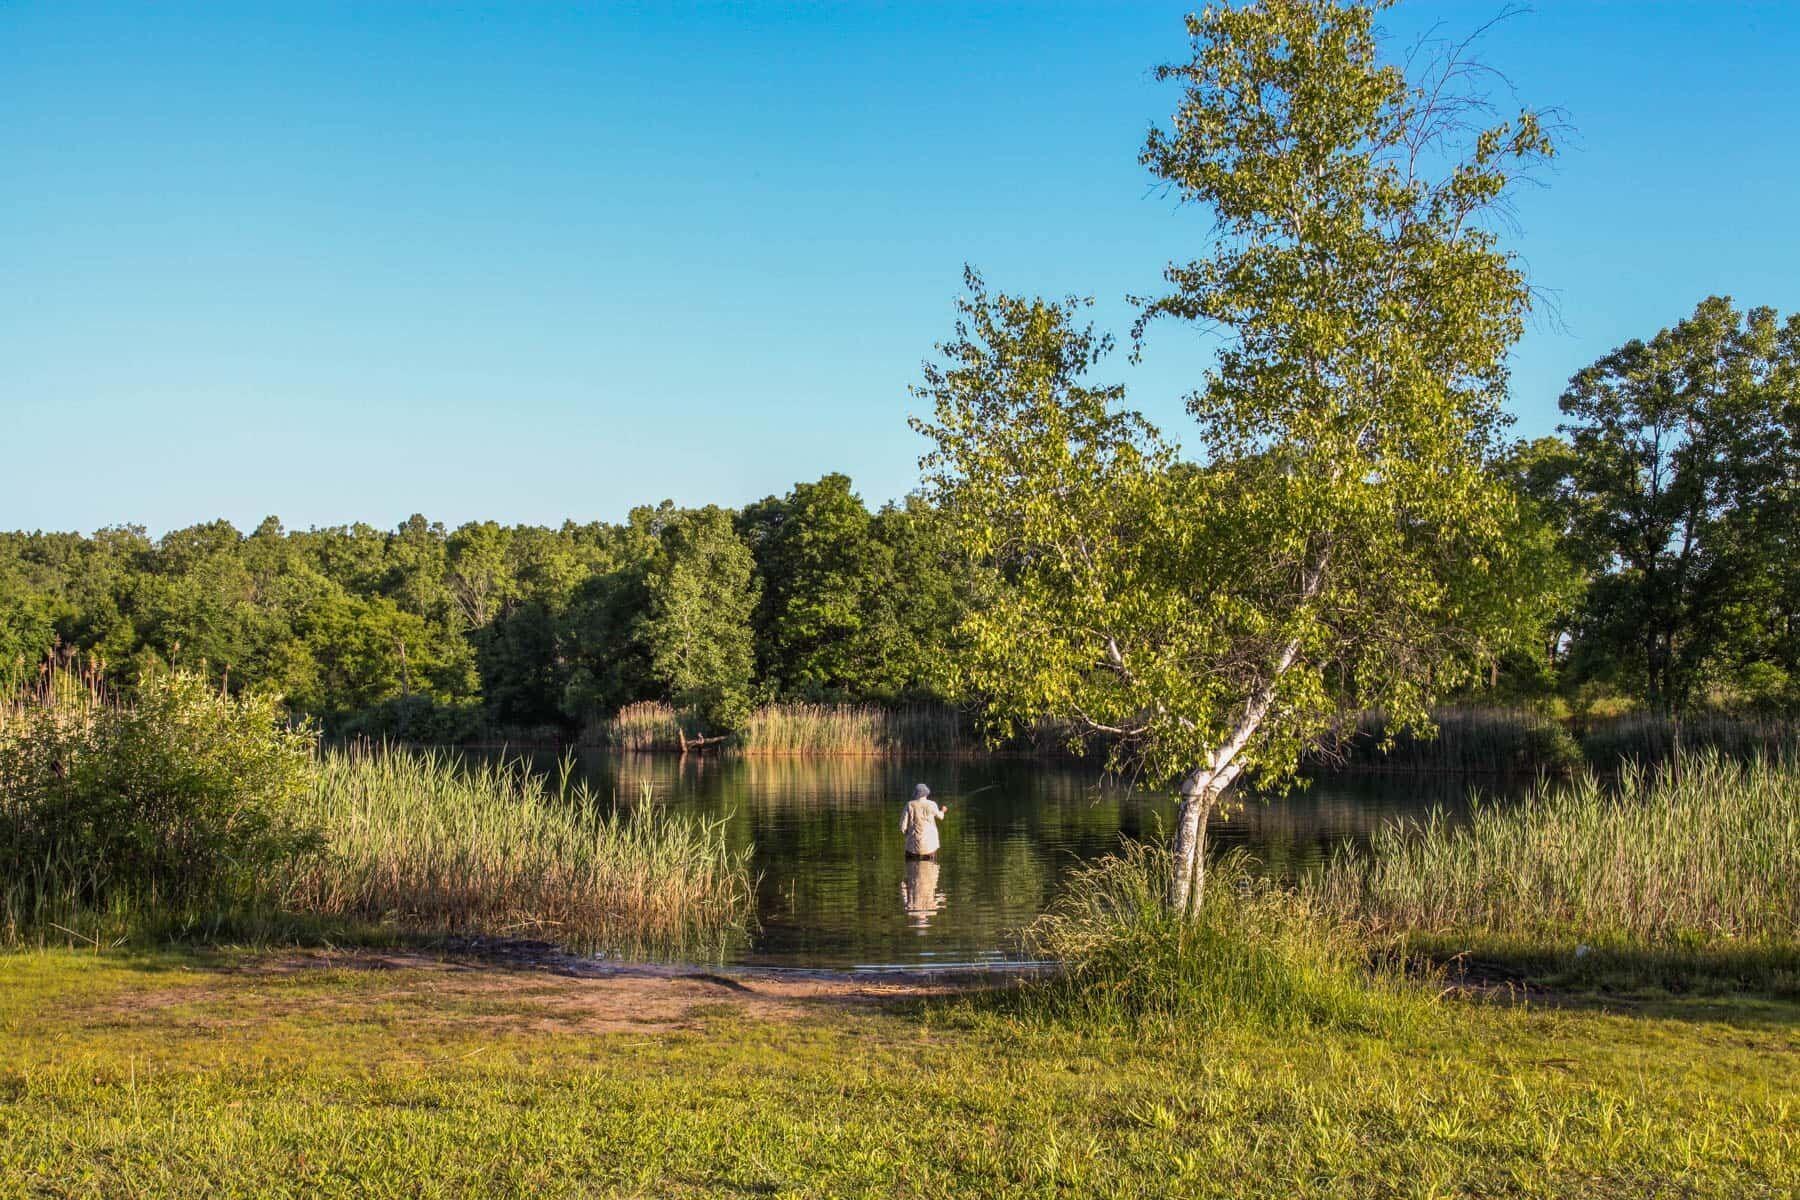 'Green Oak Crossing' by M/I Homes-Michigan in Ann Arbor